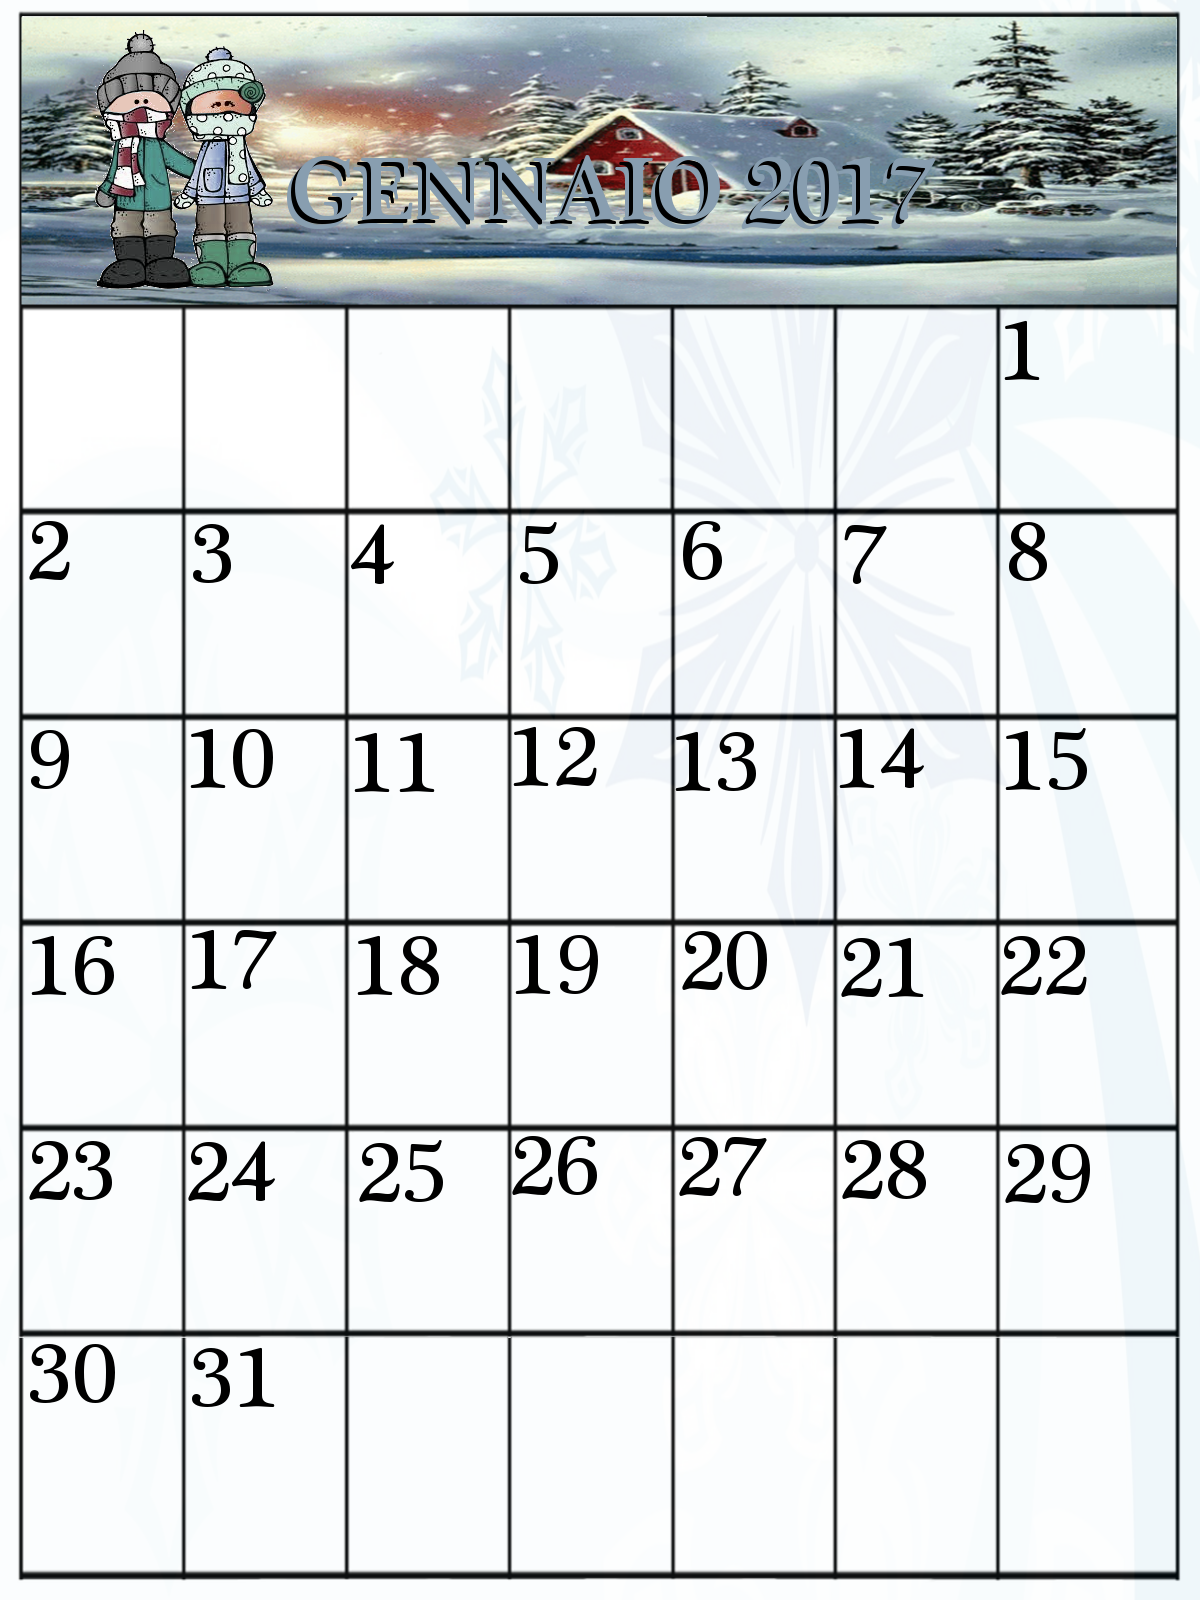 Favoloso Calendari Gennaio 2017 da stampare | MAMMA E CASALINGA HU55